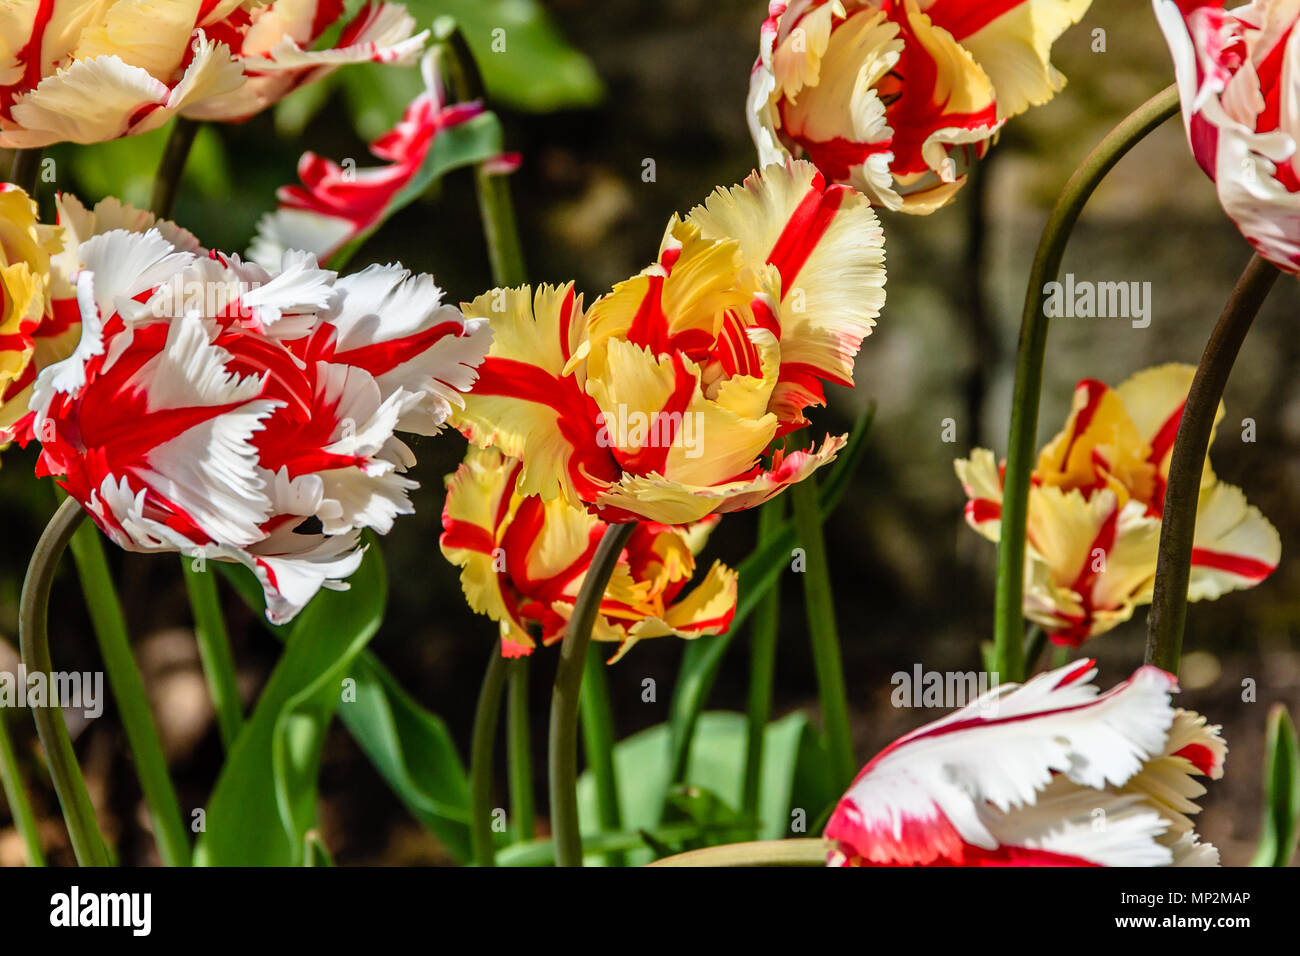 Flamboyant parrot tulips, May 2018 - Stock Image